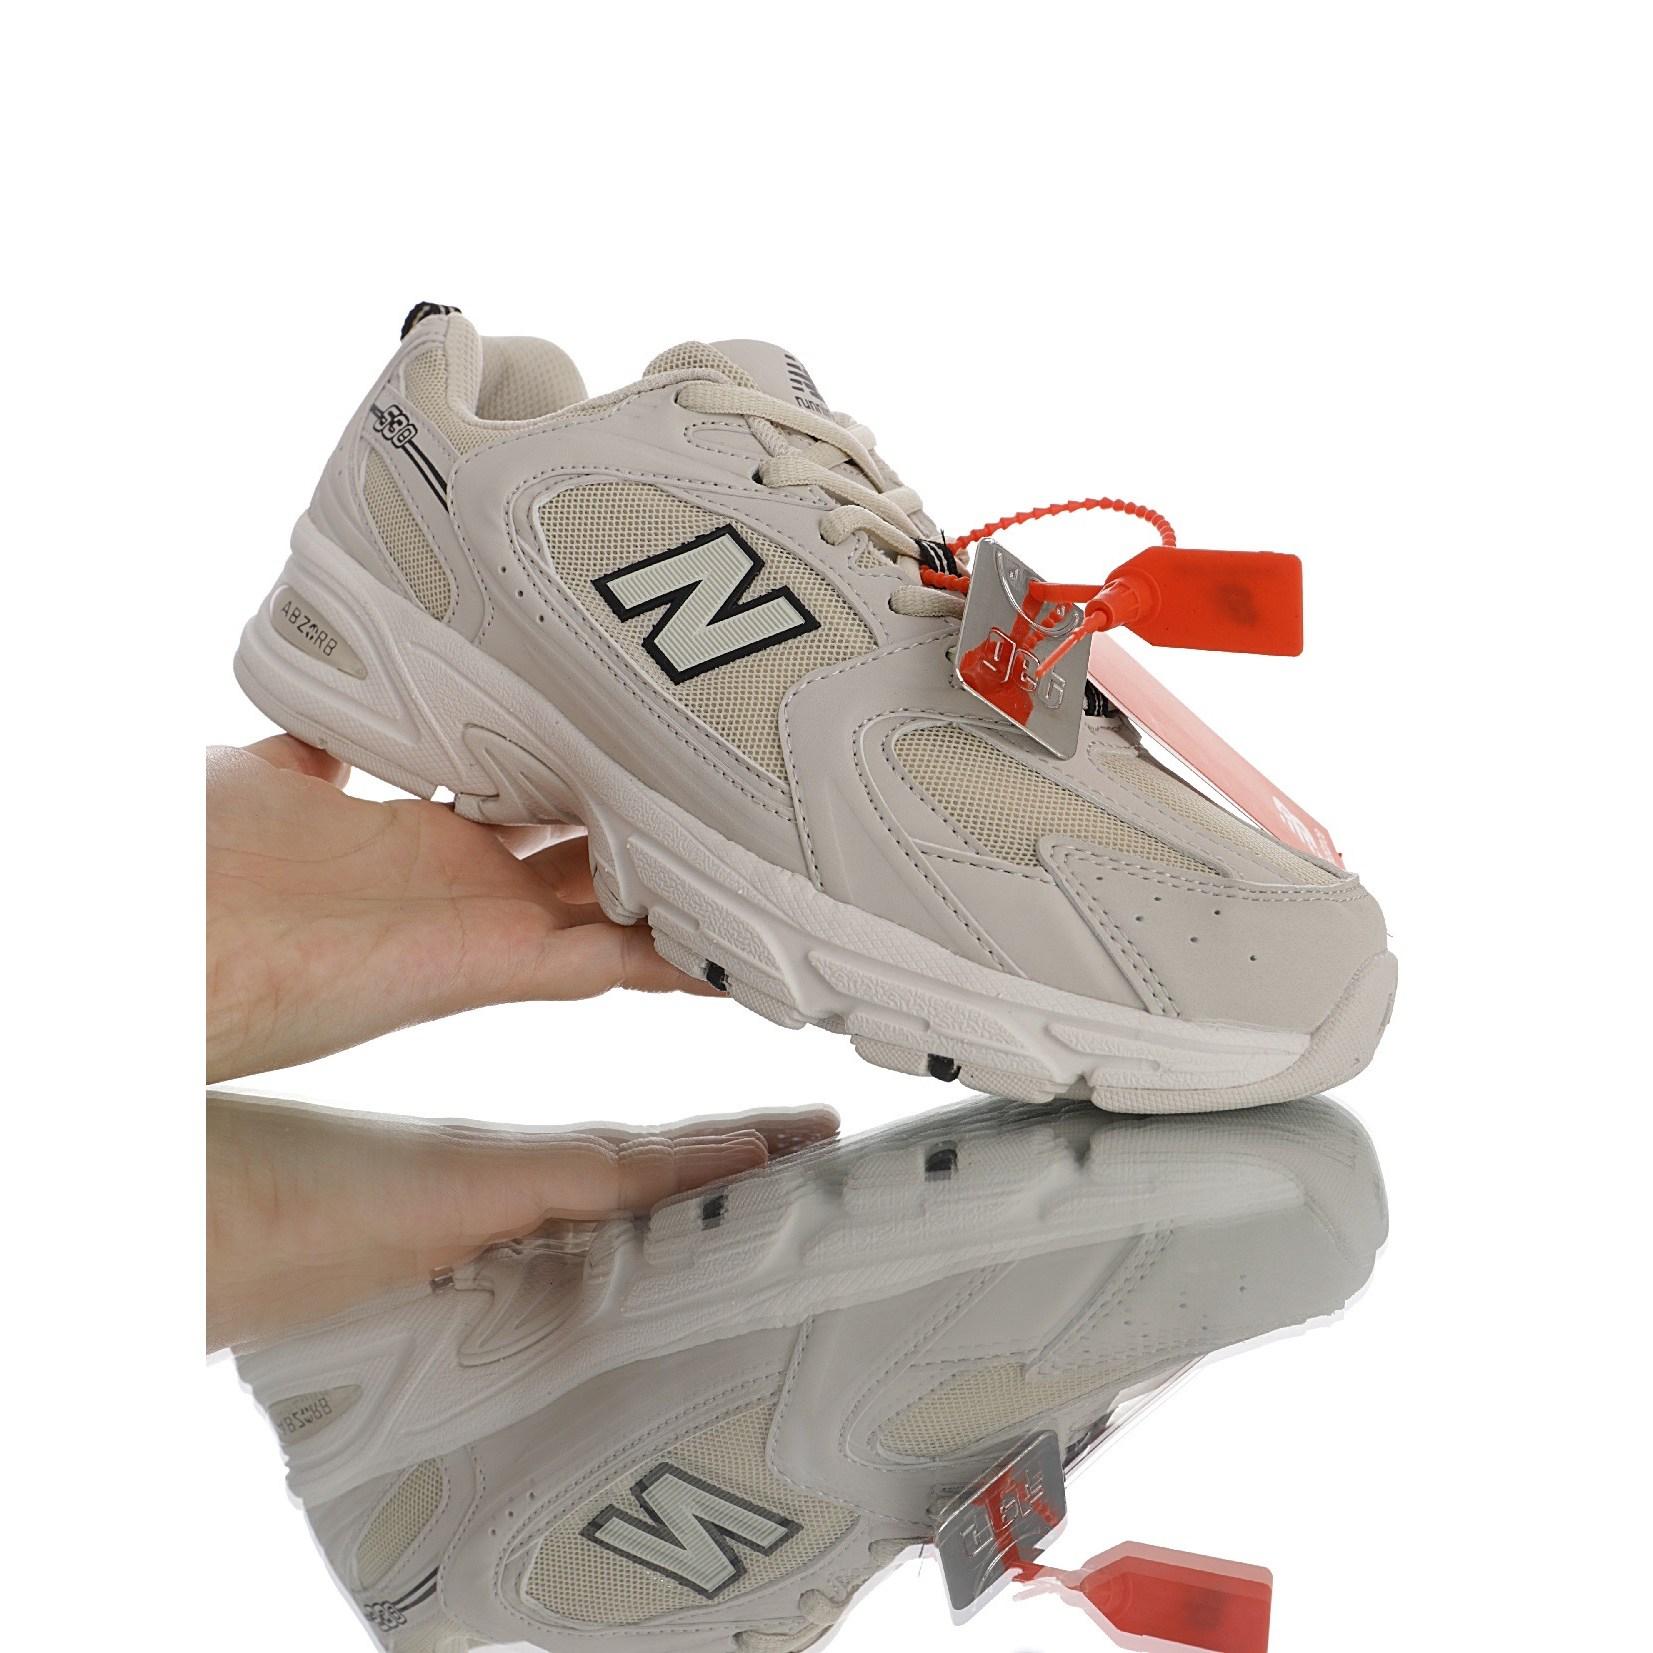 NB MR530 뉴발란스 MR530SH